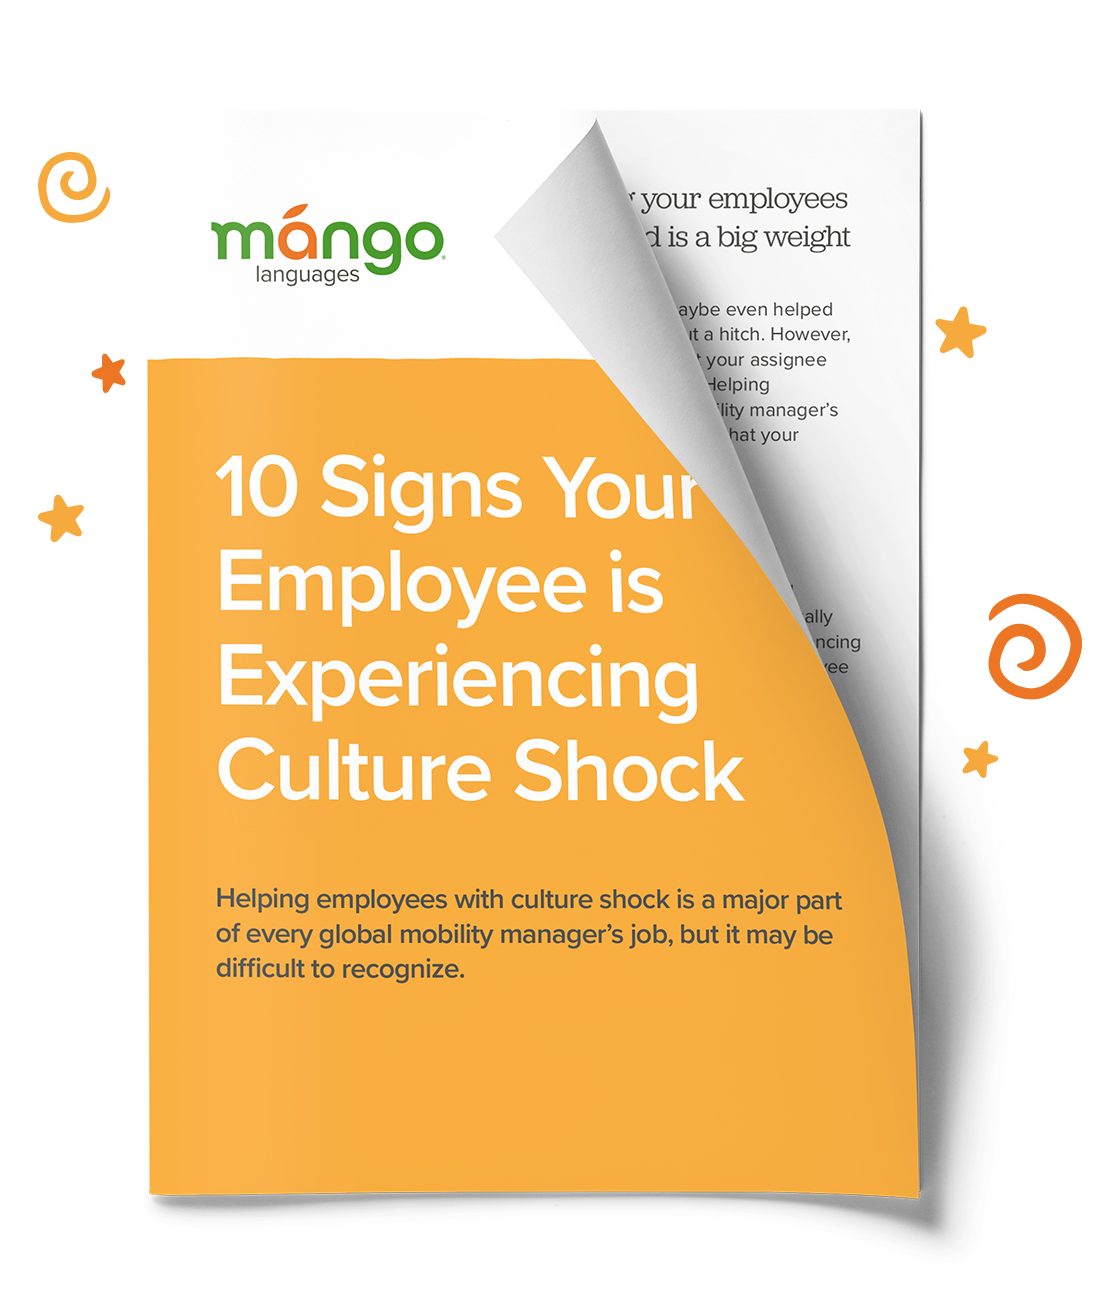 mango-inbound-10-signs-culture-shock.png